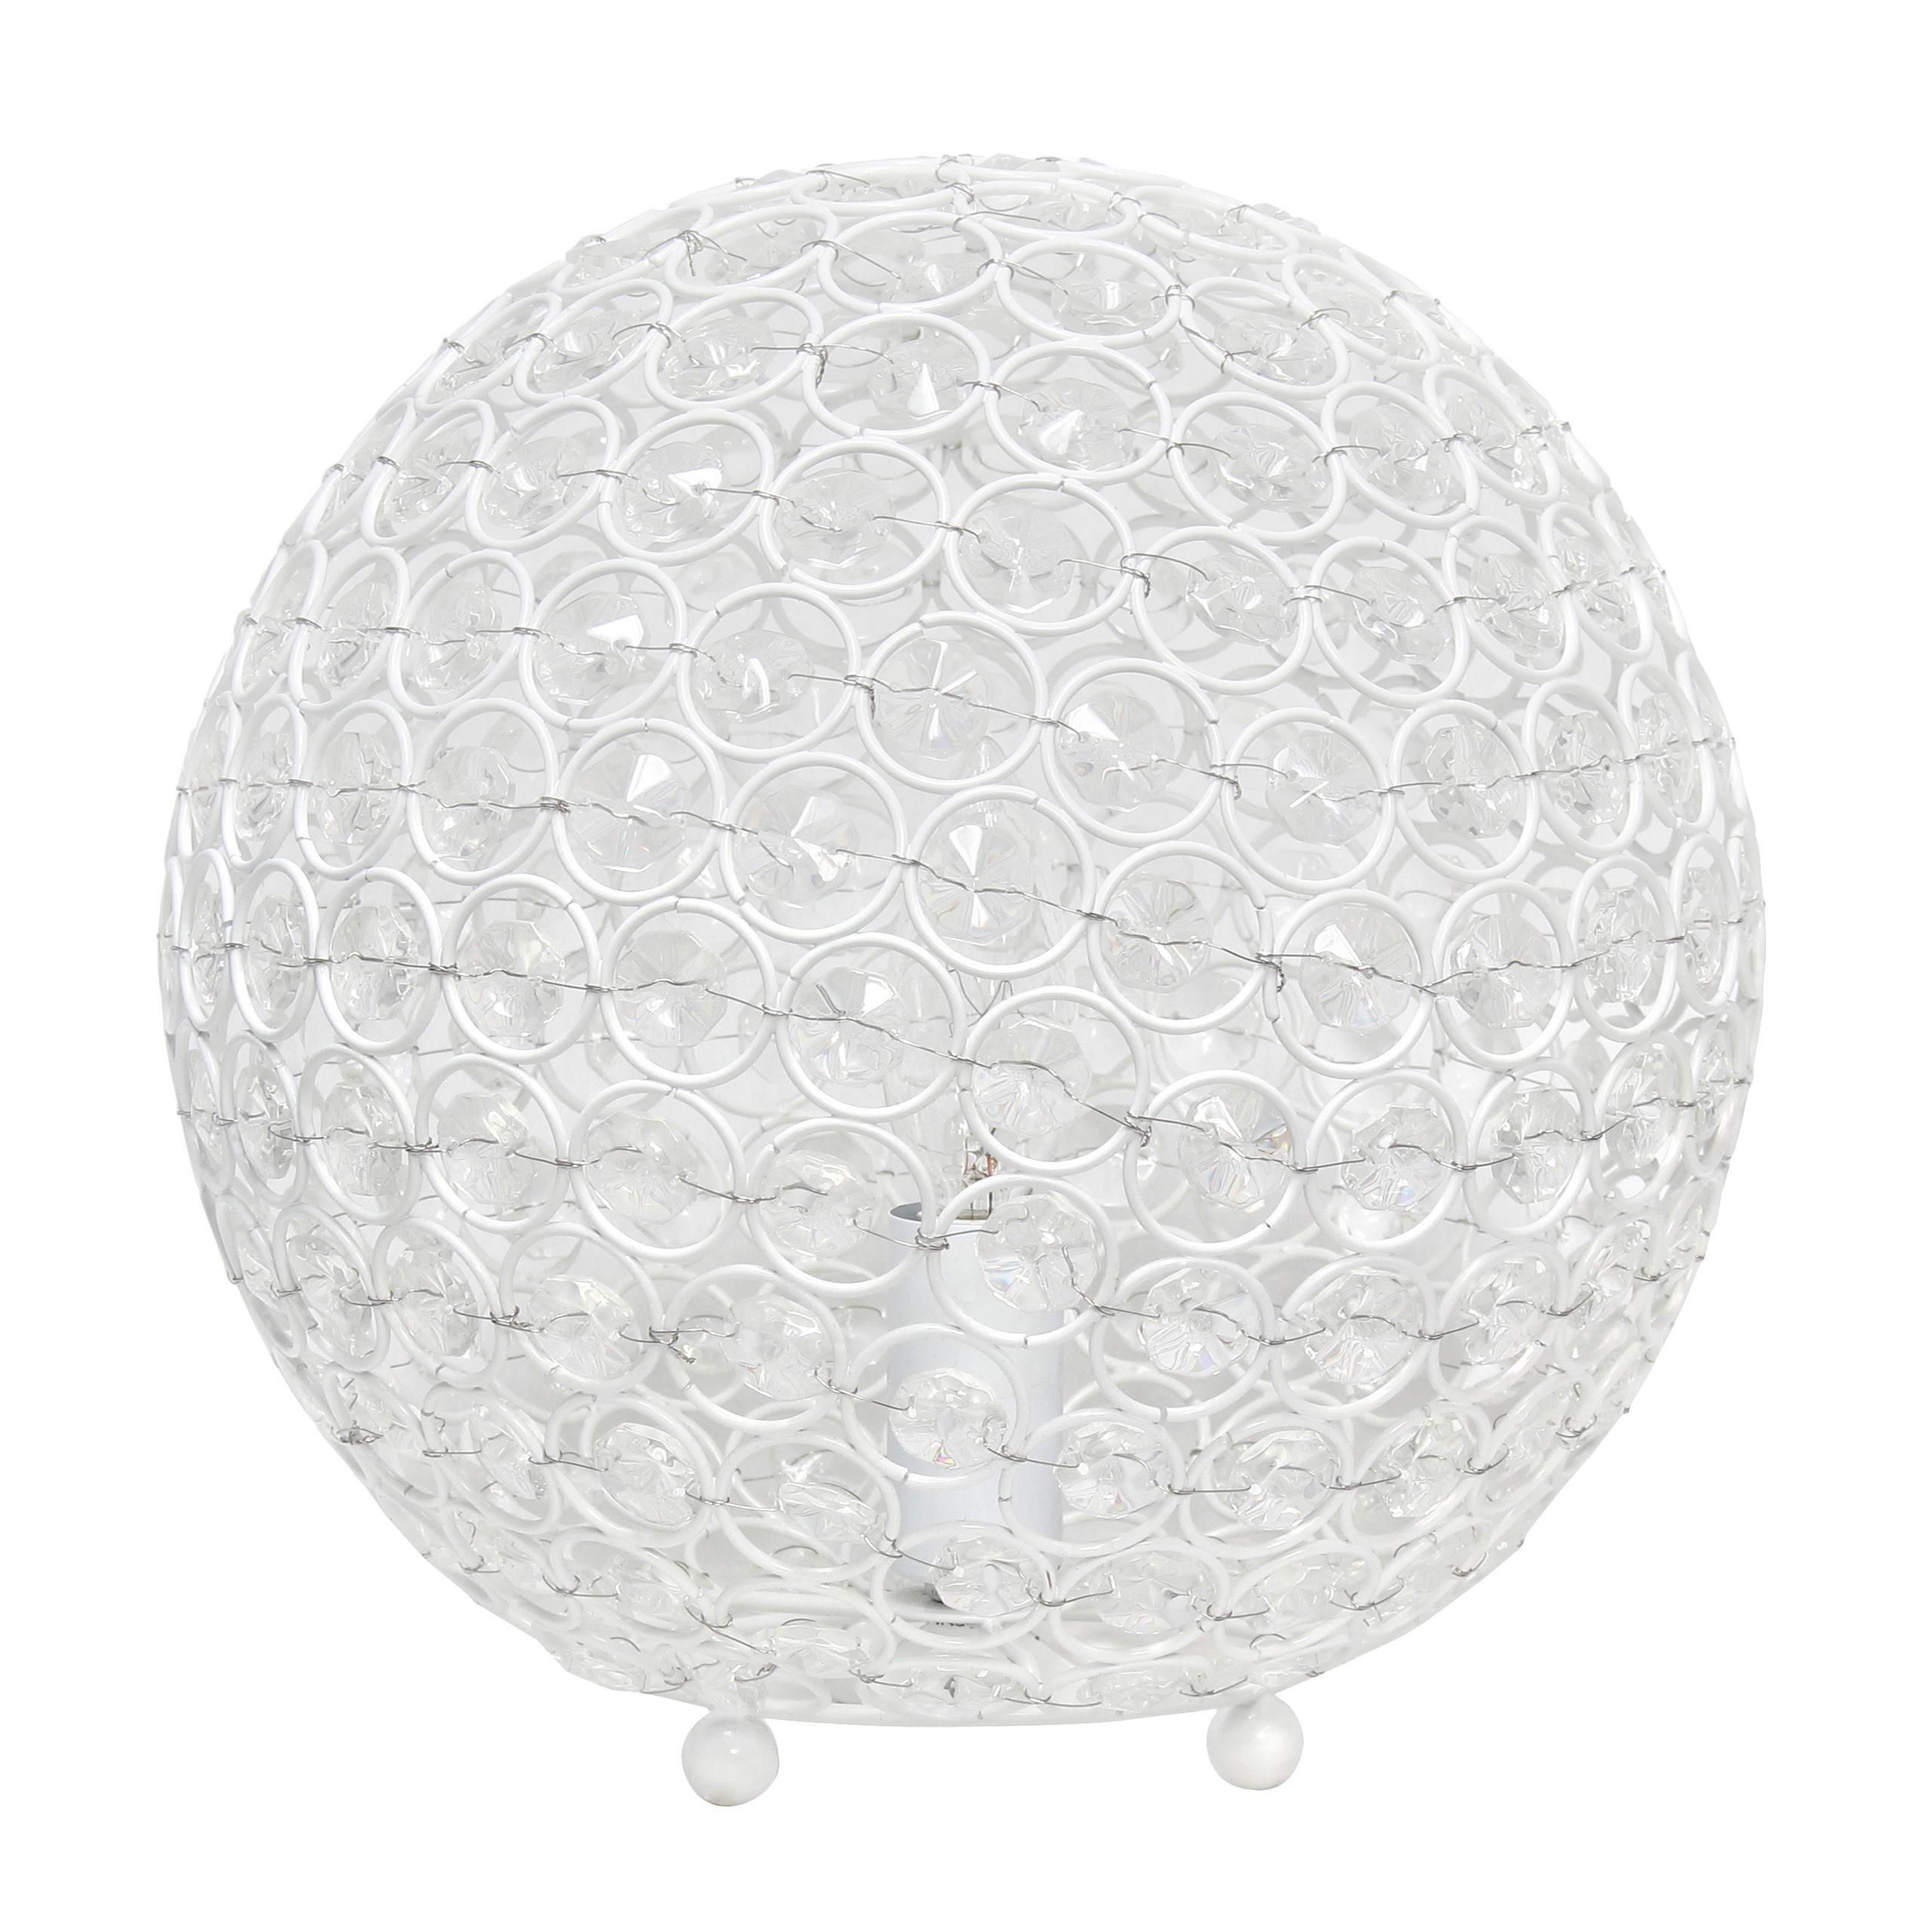 White Elegant Designs LT1067-WHT Elipse 10 Inch Crystal Ball Sequin Table Lamp